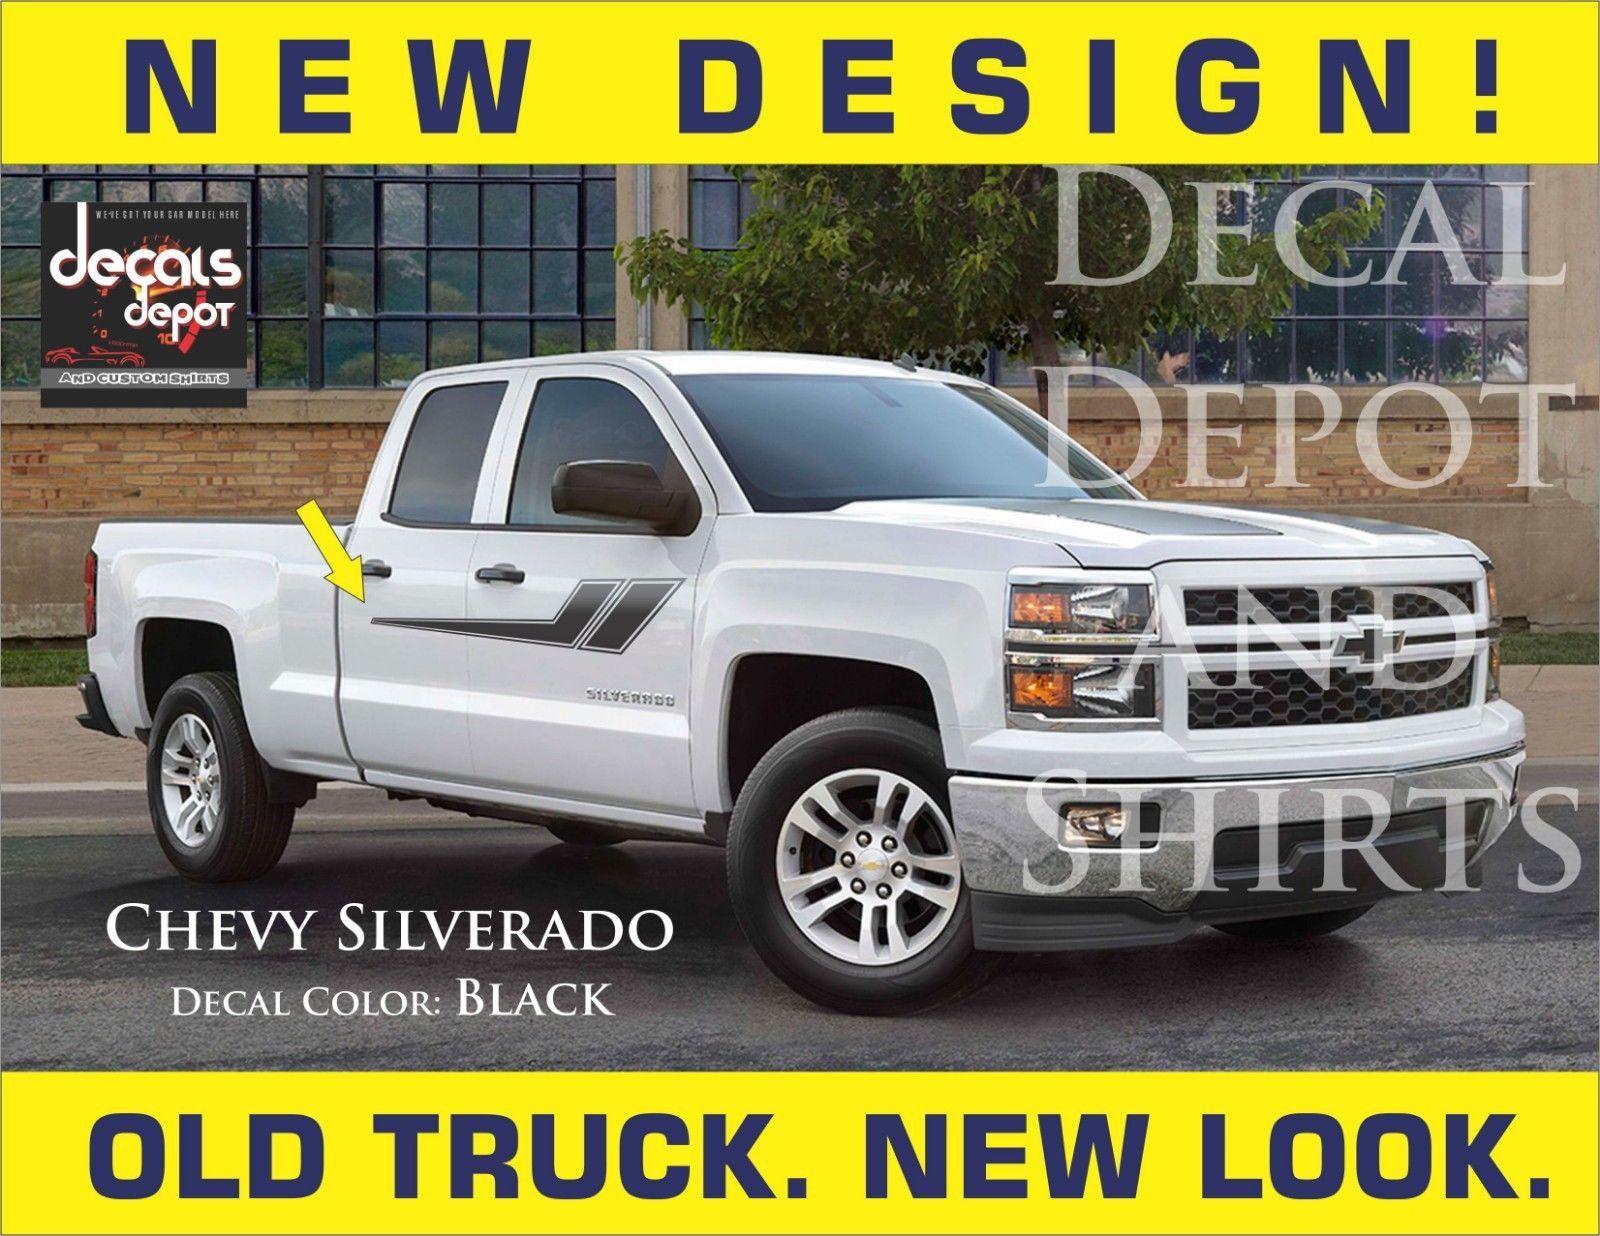 2 trd off road toyota tacoma tundra pair decals sticker truck door side vinyl ebay